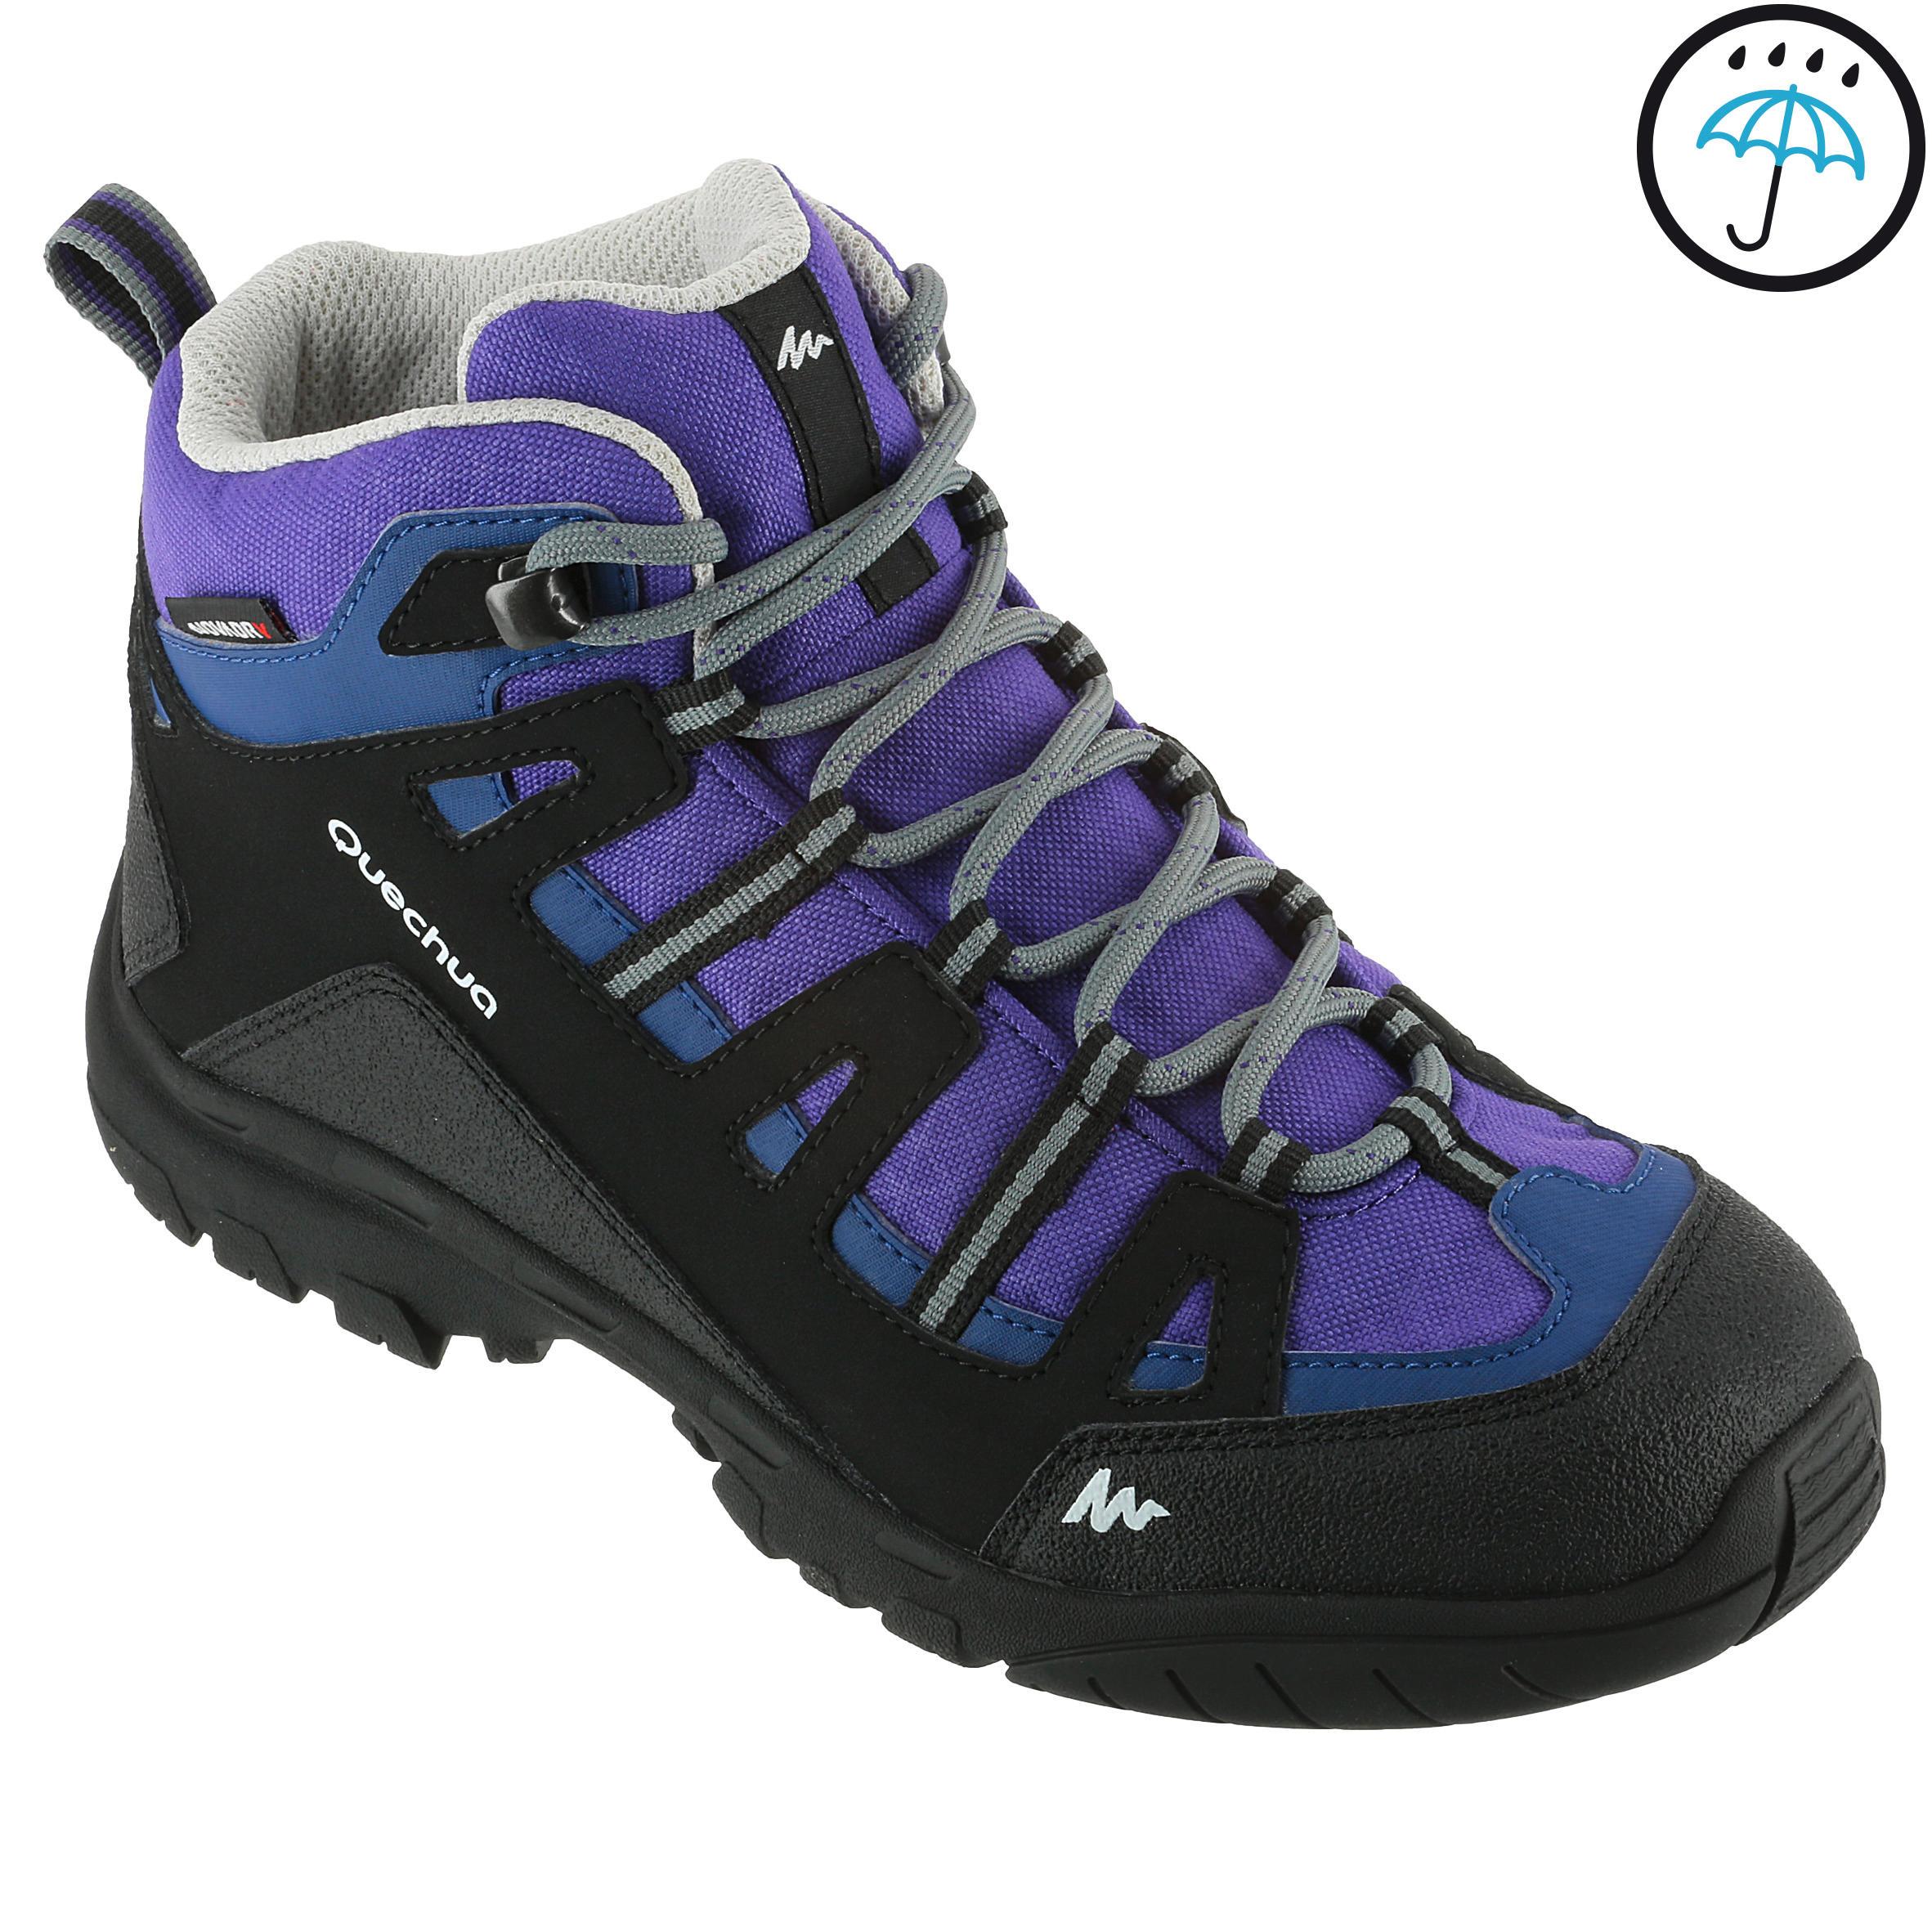 Arpenaz 100 Children's Waterproof Hiking Shoes Med – Purple